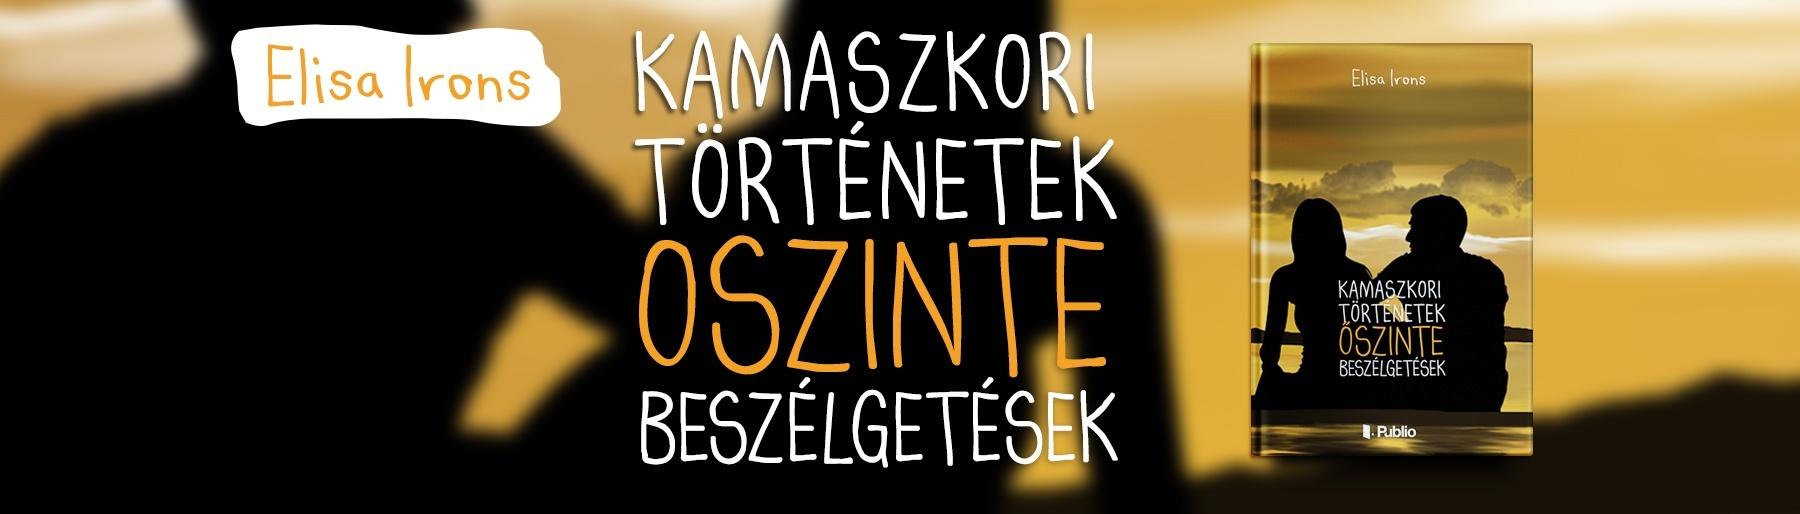 http://admin.konyvaruhaz.info/media/files/kamasz1800.jpg